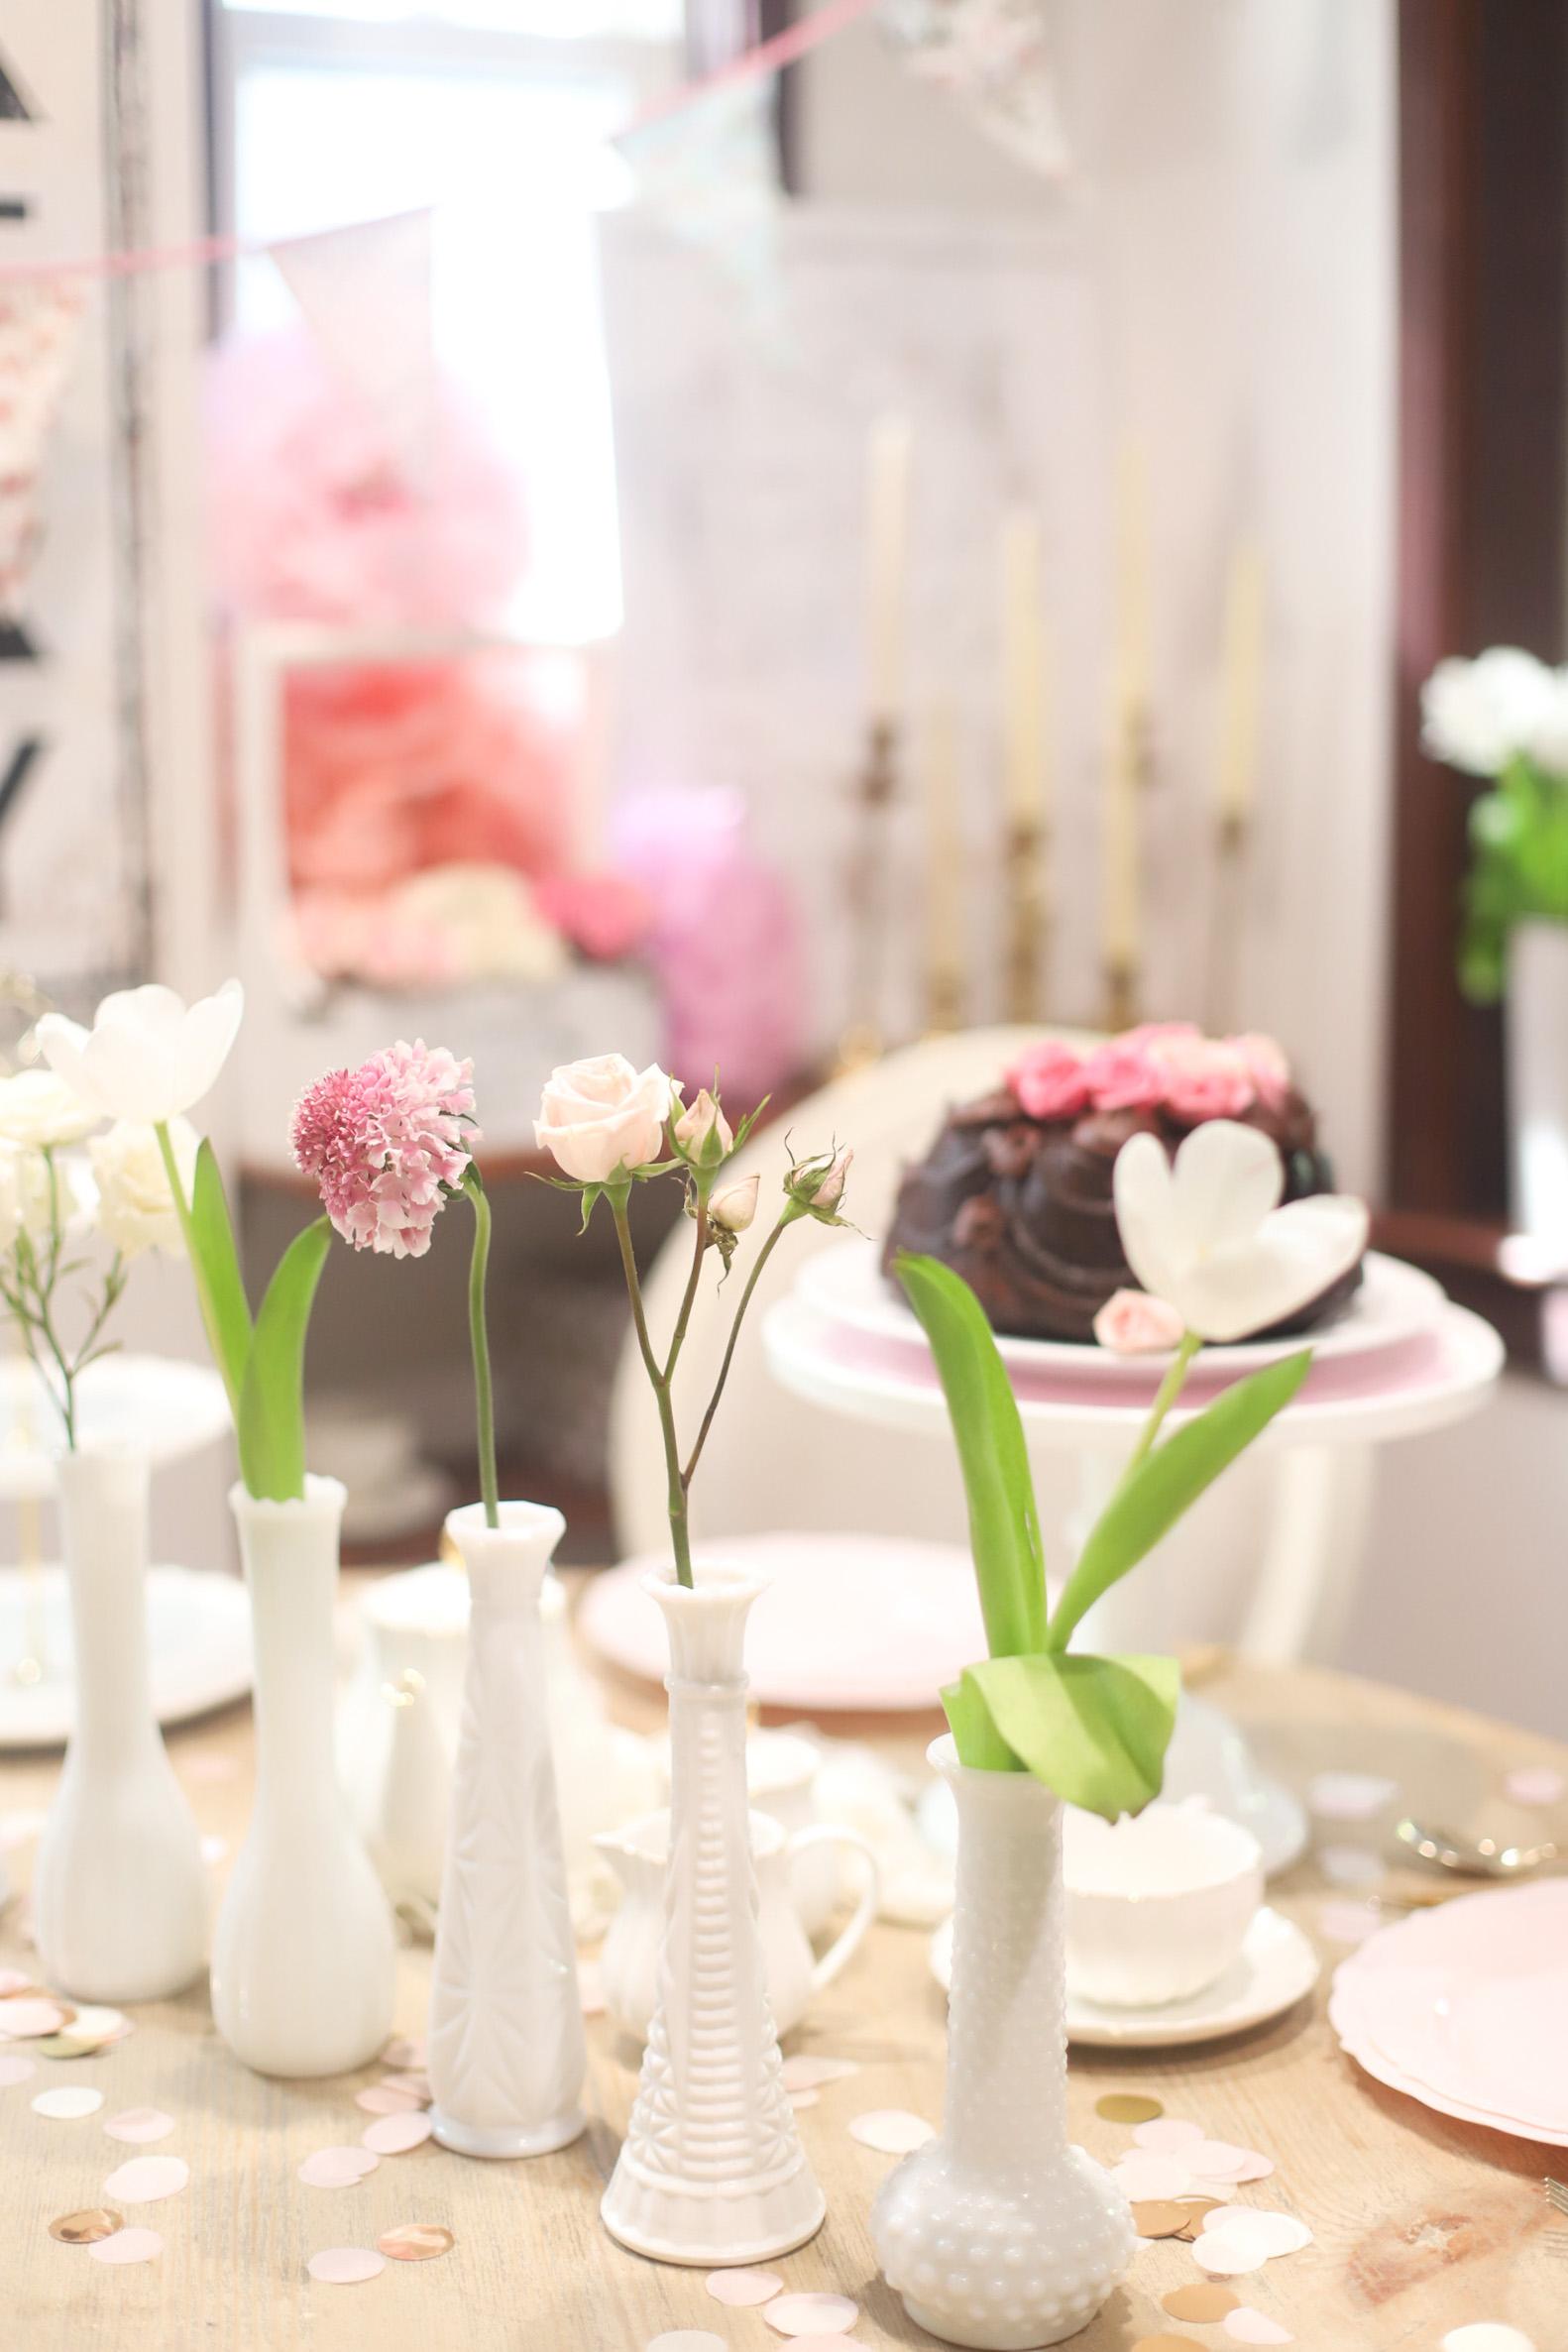 Emmeline's 3rd Birthday Tea Party at Home | @glitterinclexi | GLITTERINC.COM